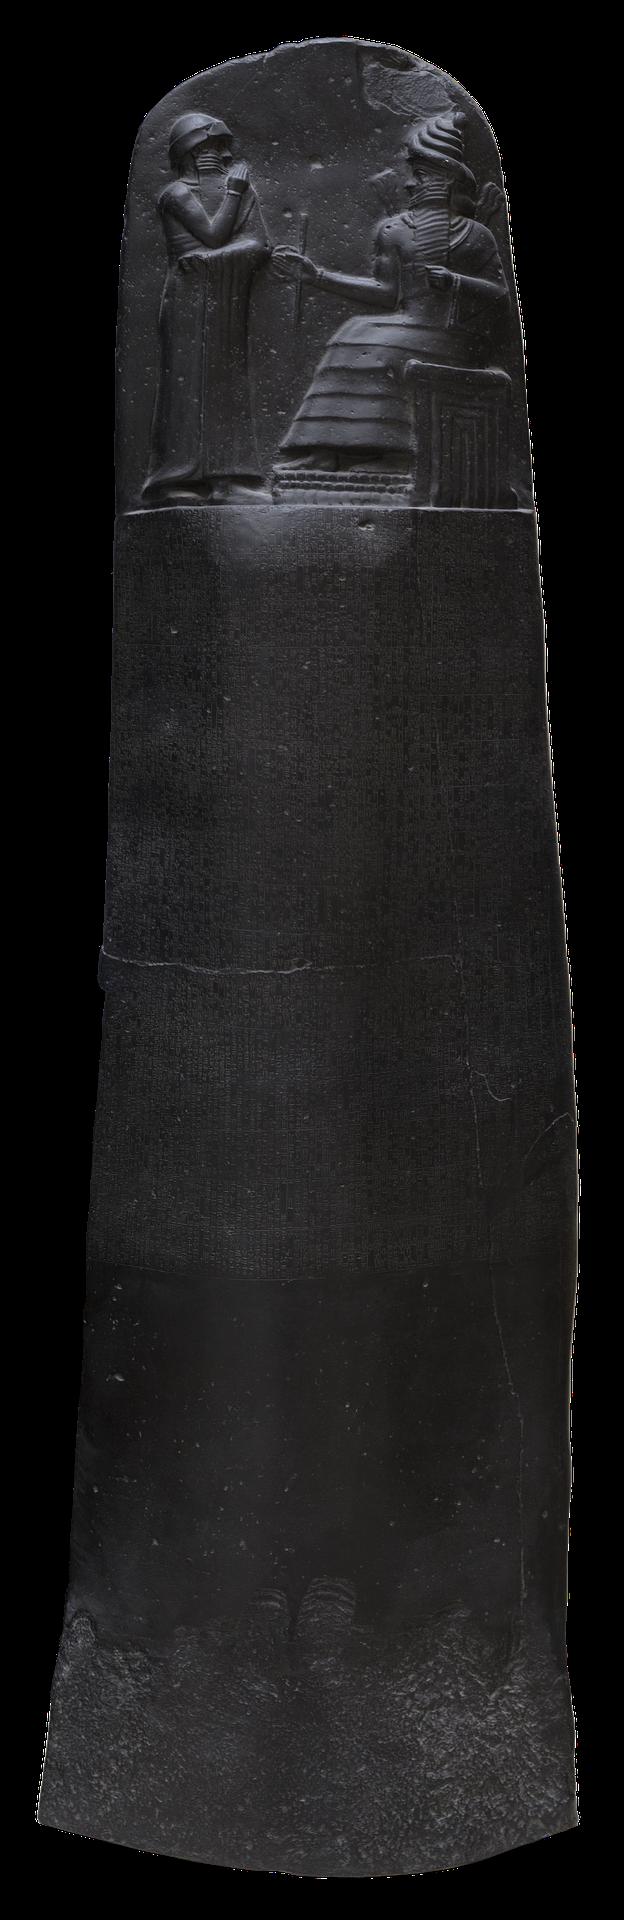 hammurabi-1626388_1920 (1)